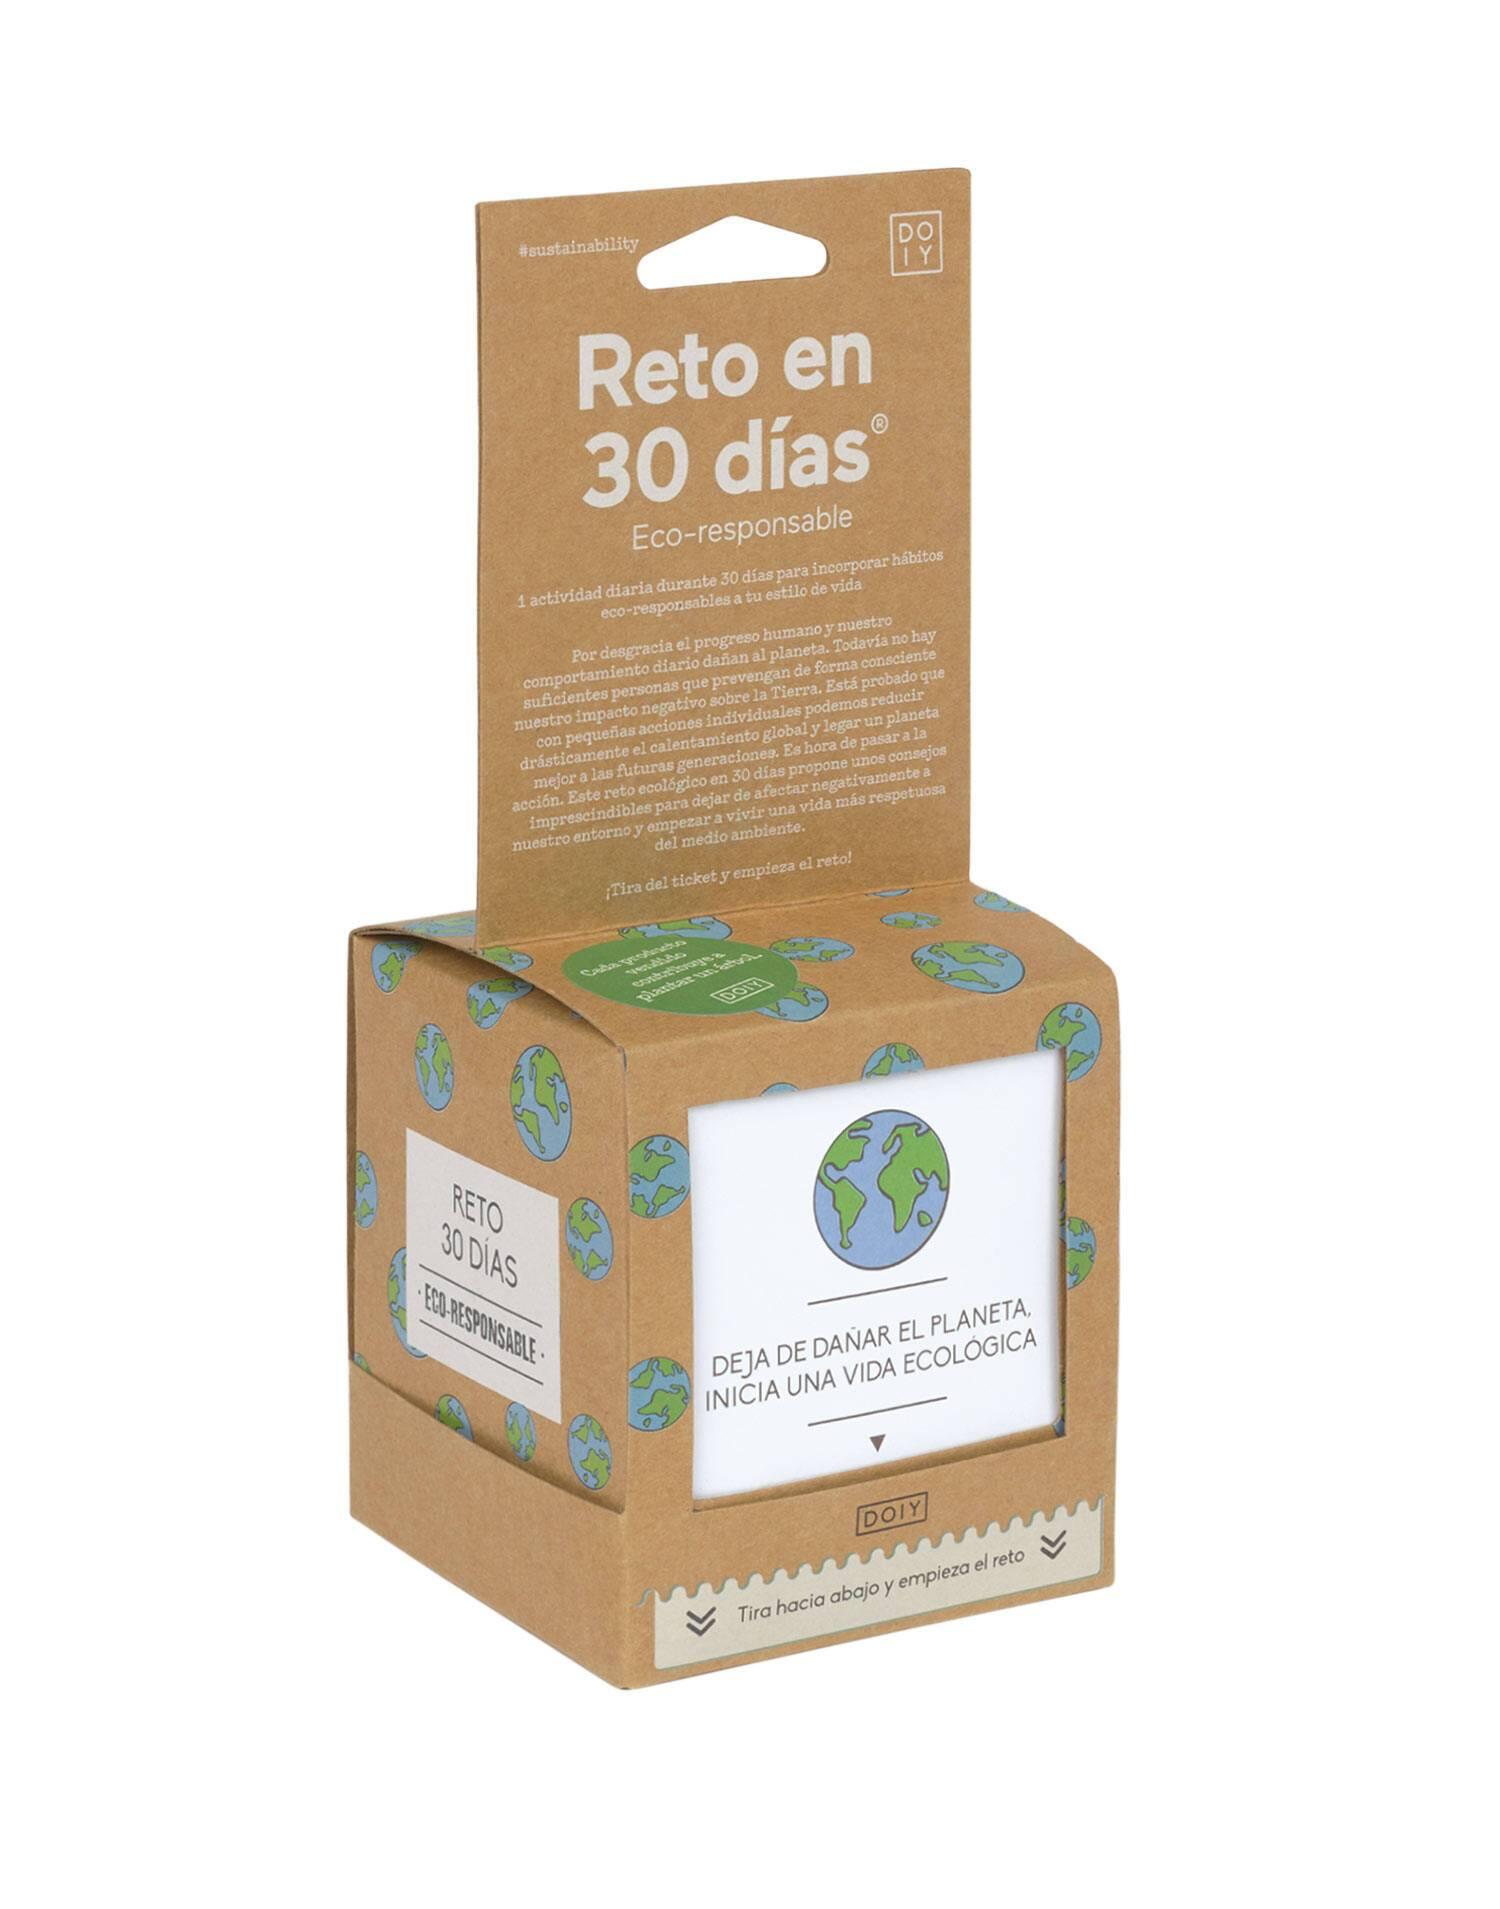 Reto 30 días en español